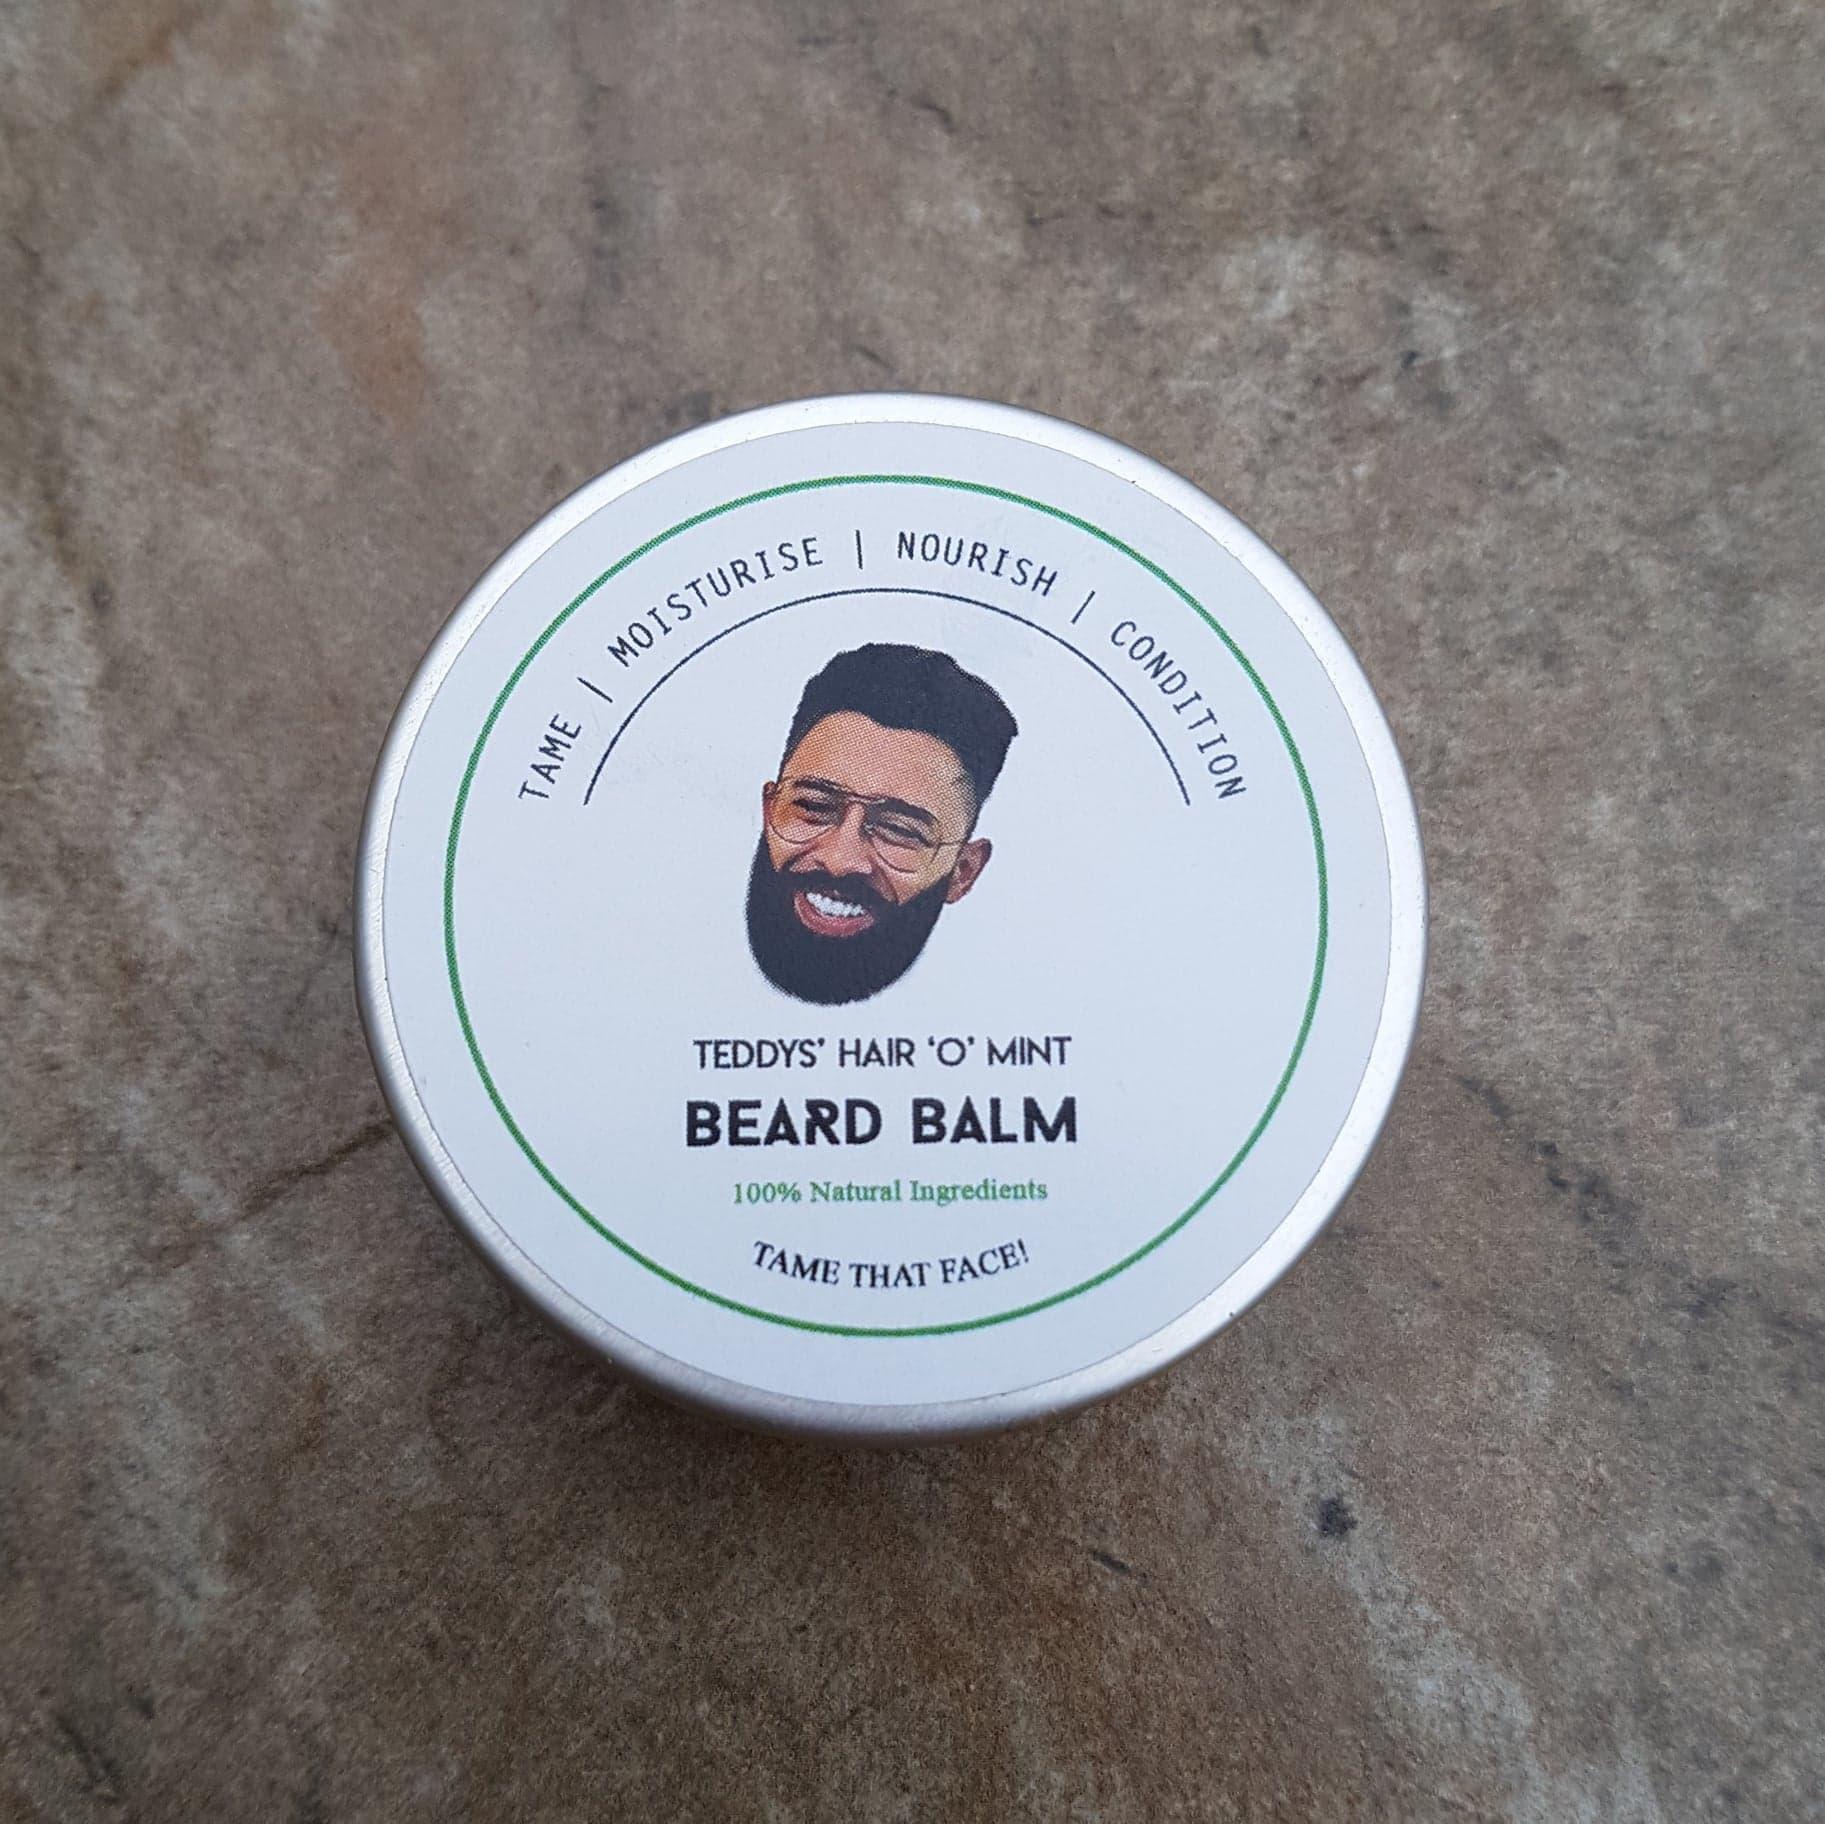 Review of the Teddy's Hair 'O' Mint Beard Balm